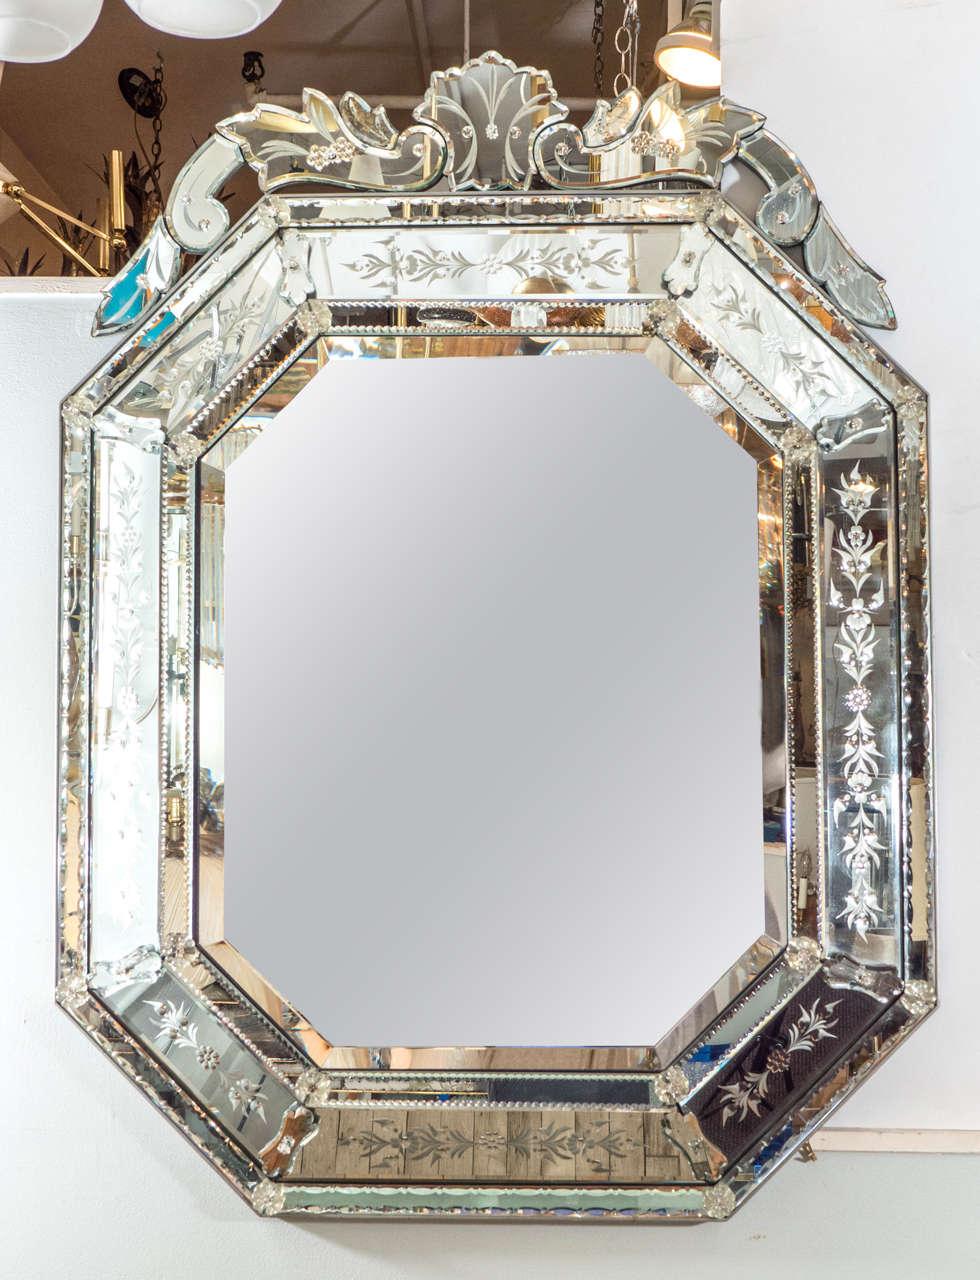 A Venetian Midcentury Beveled Wall Mirror at 1stdibs